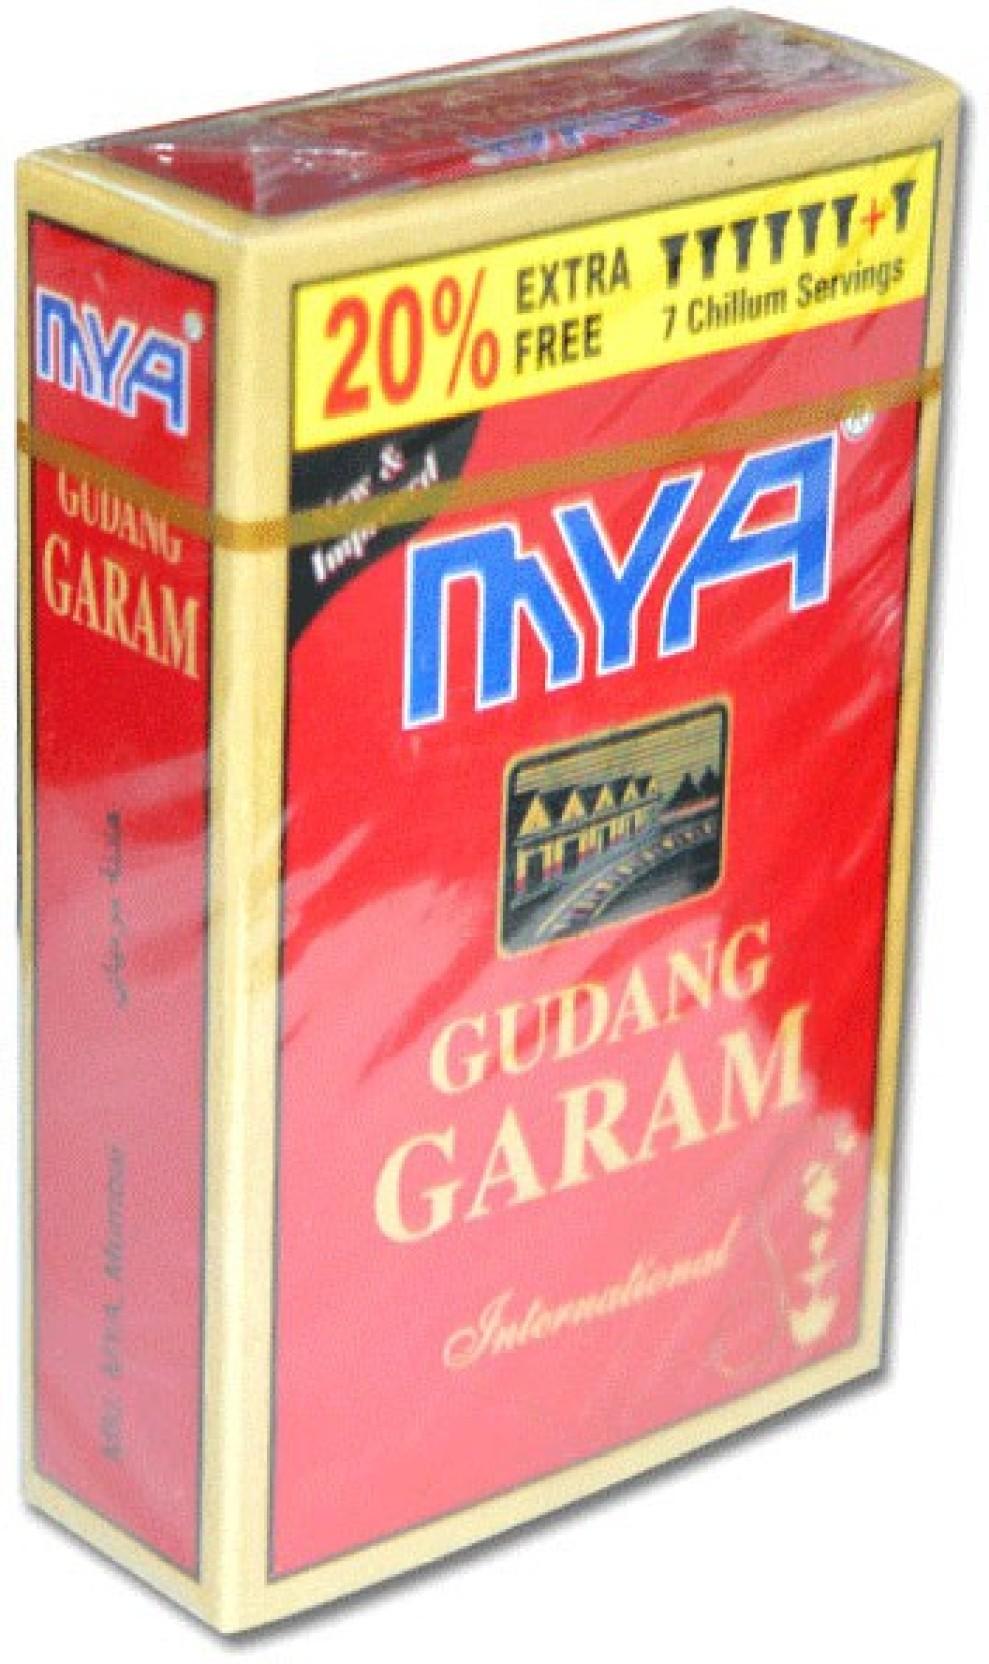 Mya Little Goa Gudang Garam Assorted Hookah Flavor Price In India Internasional 1 G